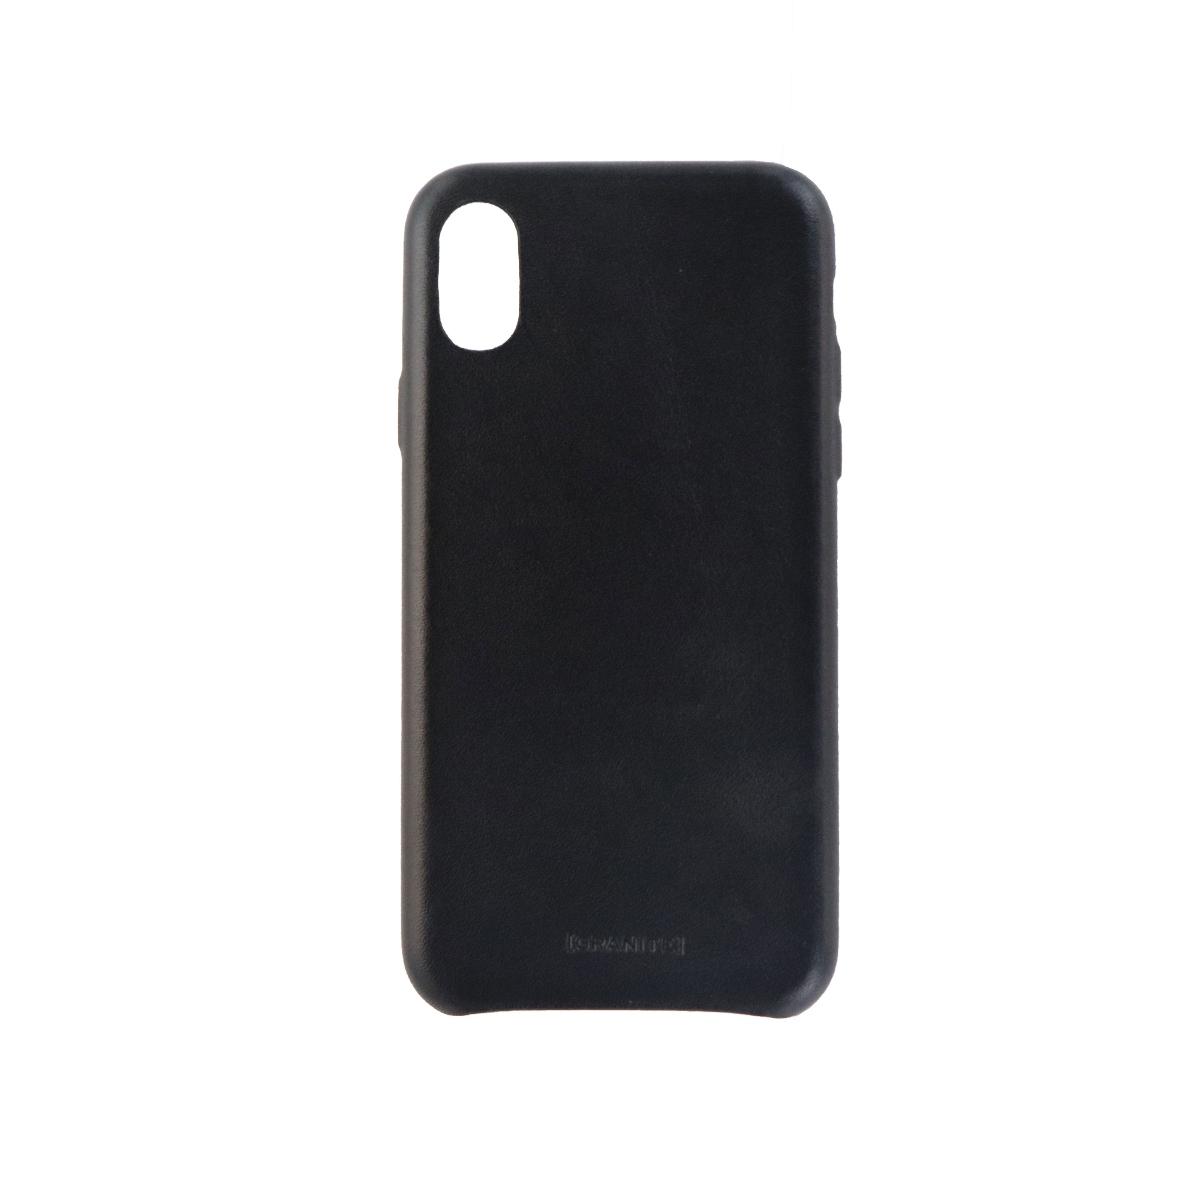 Granite Slim Genuine Leather Case Cover for Apple iPhone X 10 - Black Leather